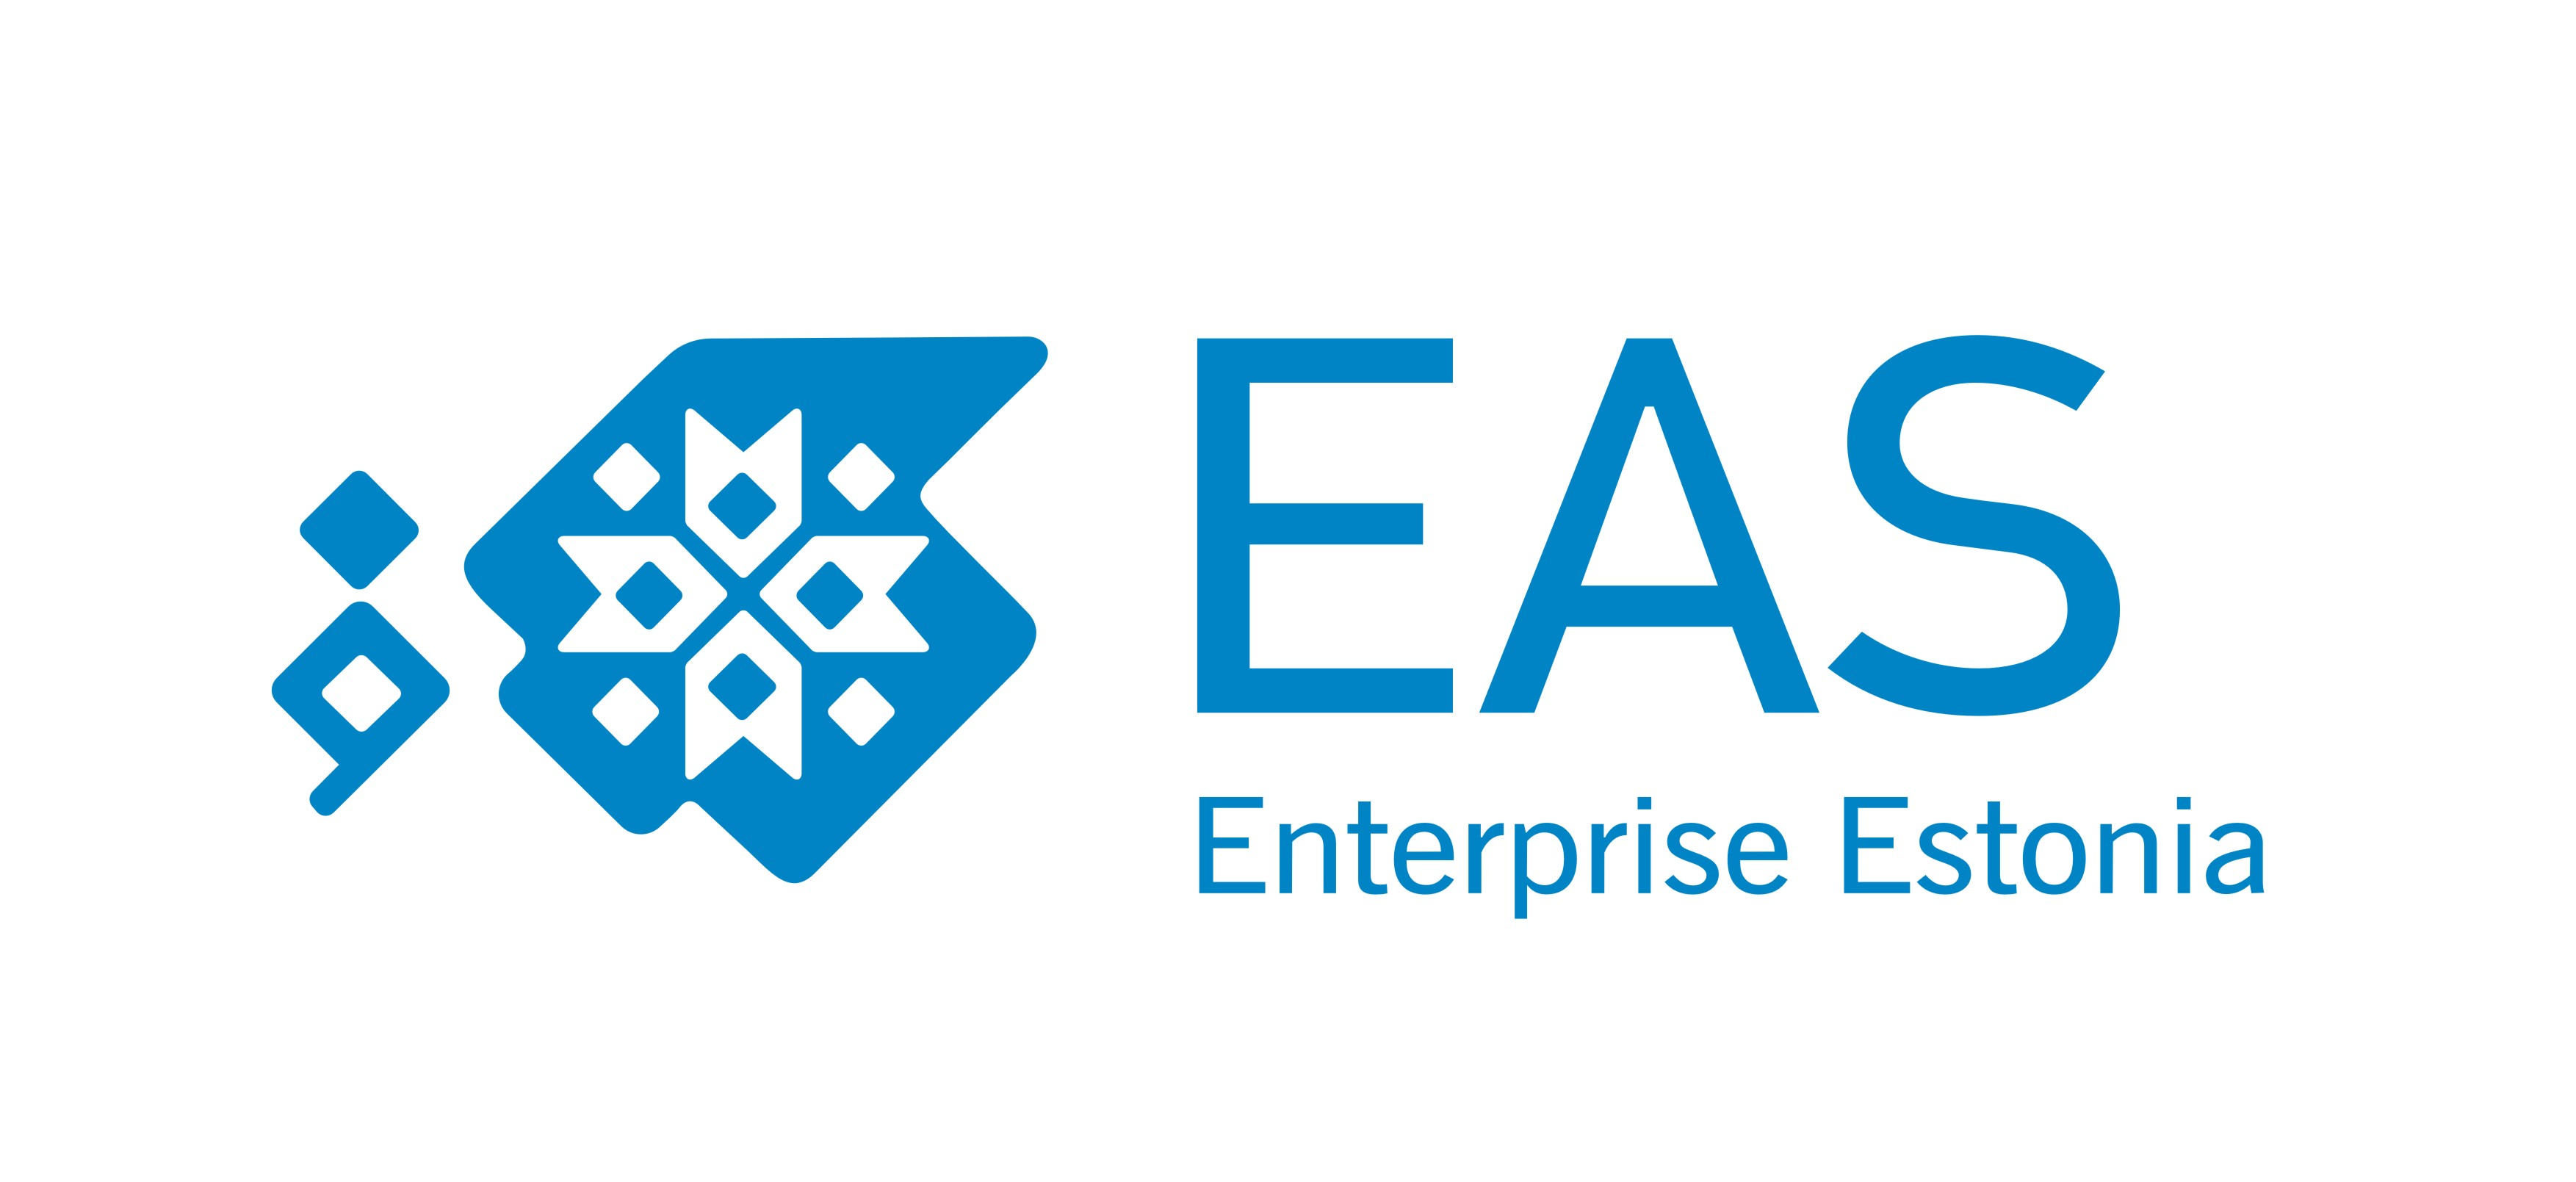 http://www.eas.ee/images/doc/sihtasutusest/logo_rakendused/eas_yhevarviline_logo_sinine.jpg